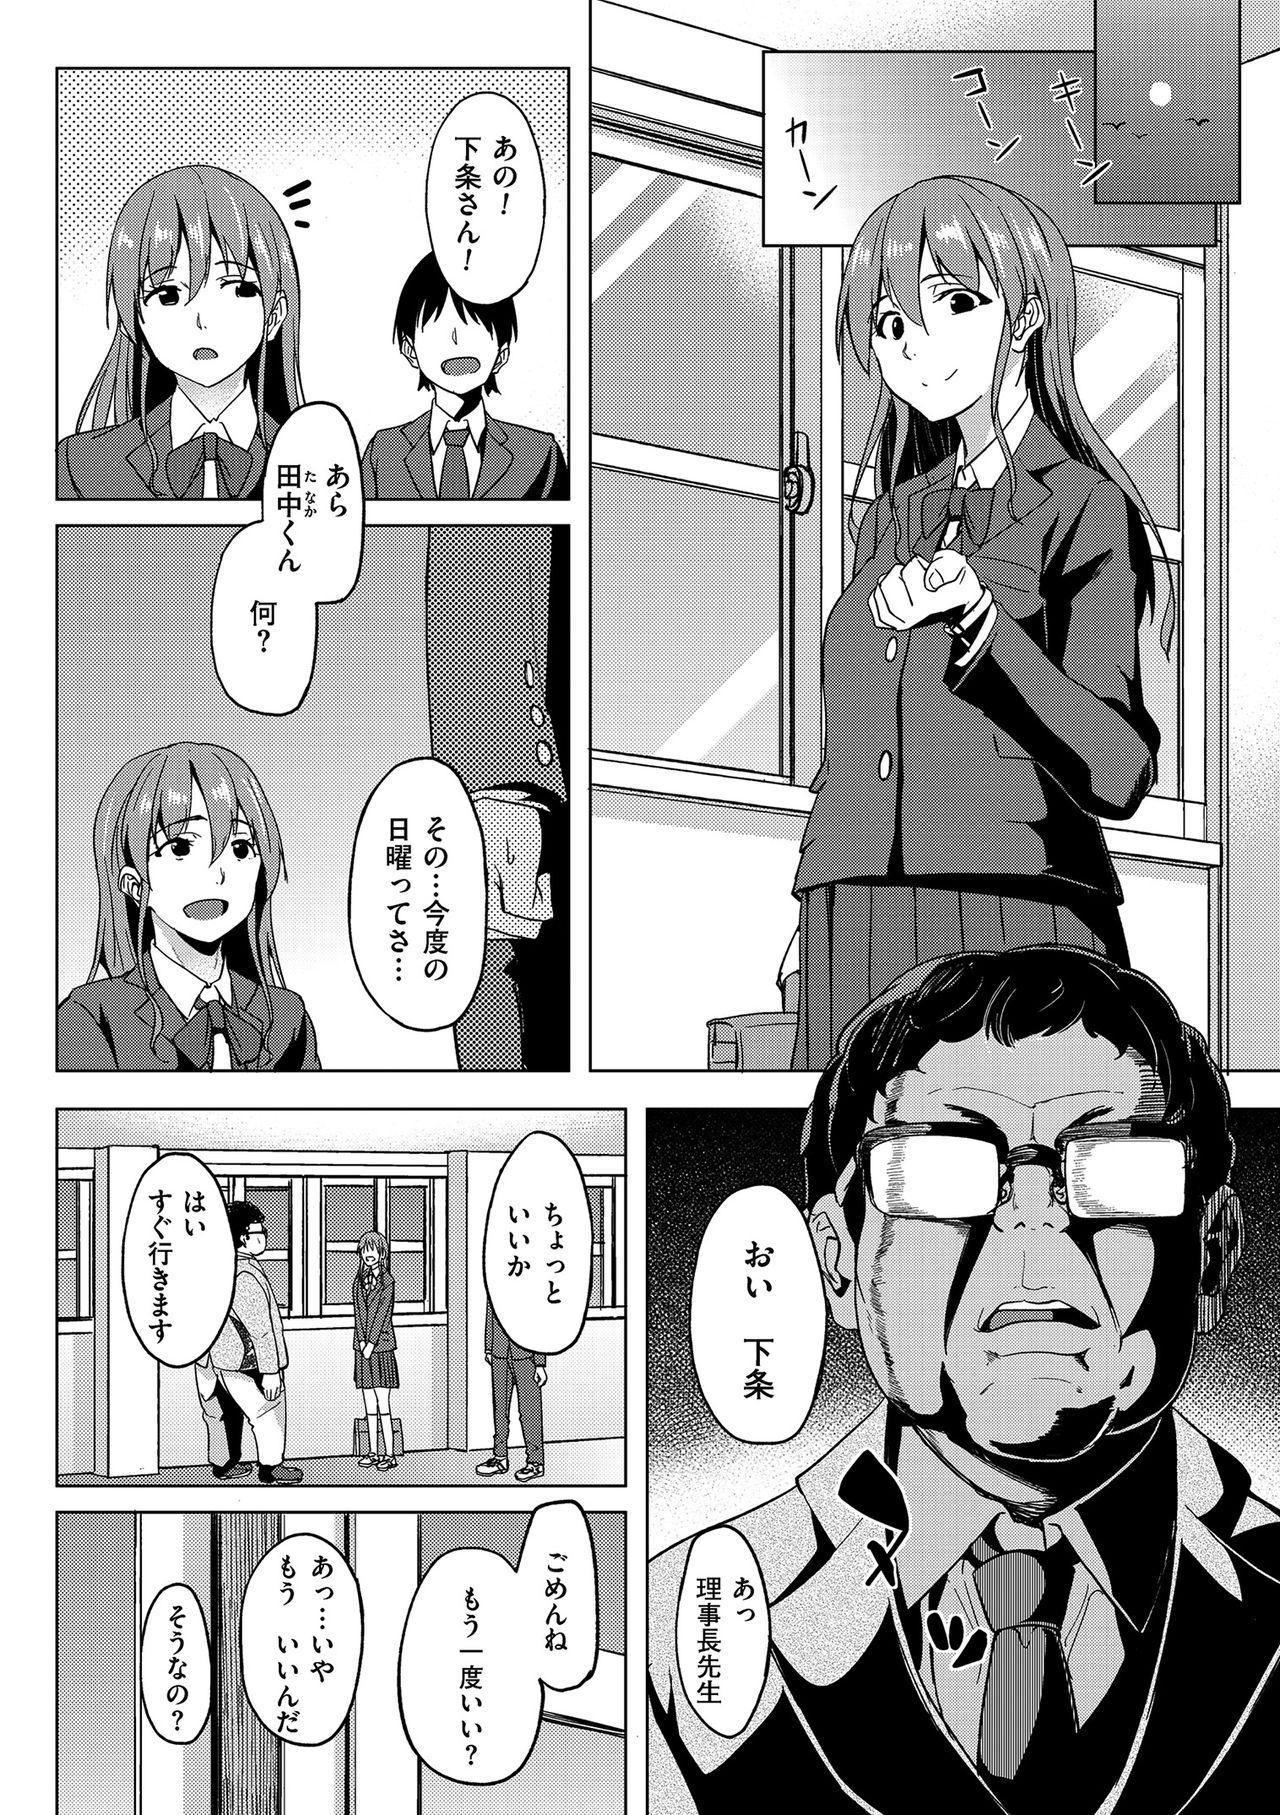 [Kosuke Haruhito] Are-zuki Kanojo - happy sexperience [Digital] 199